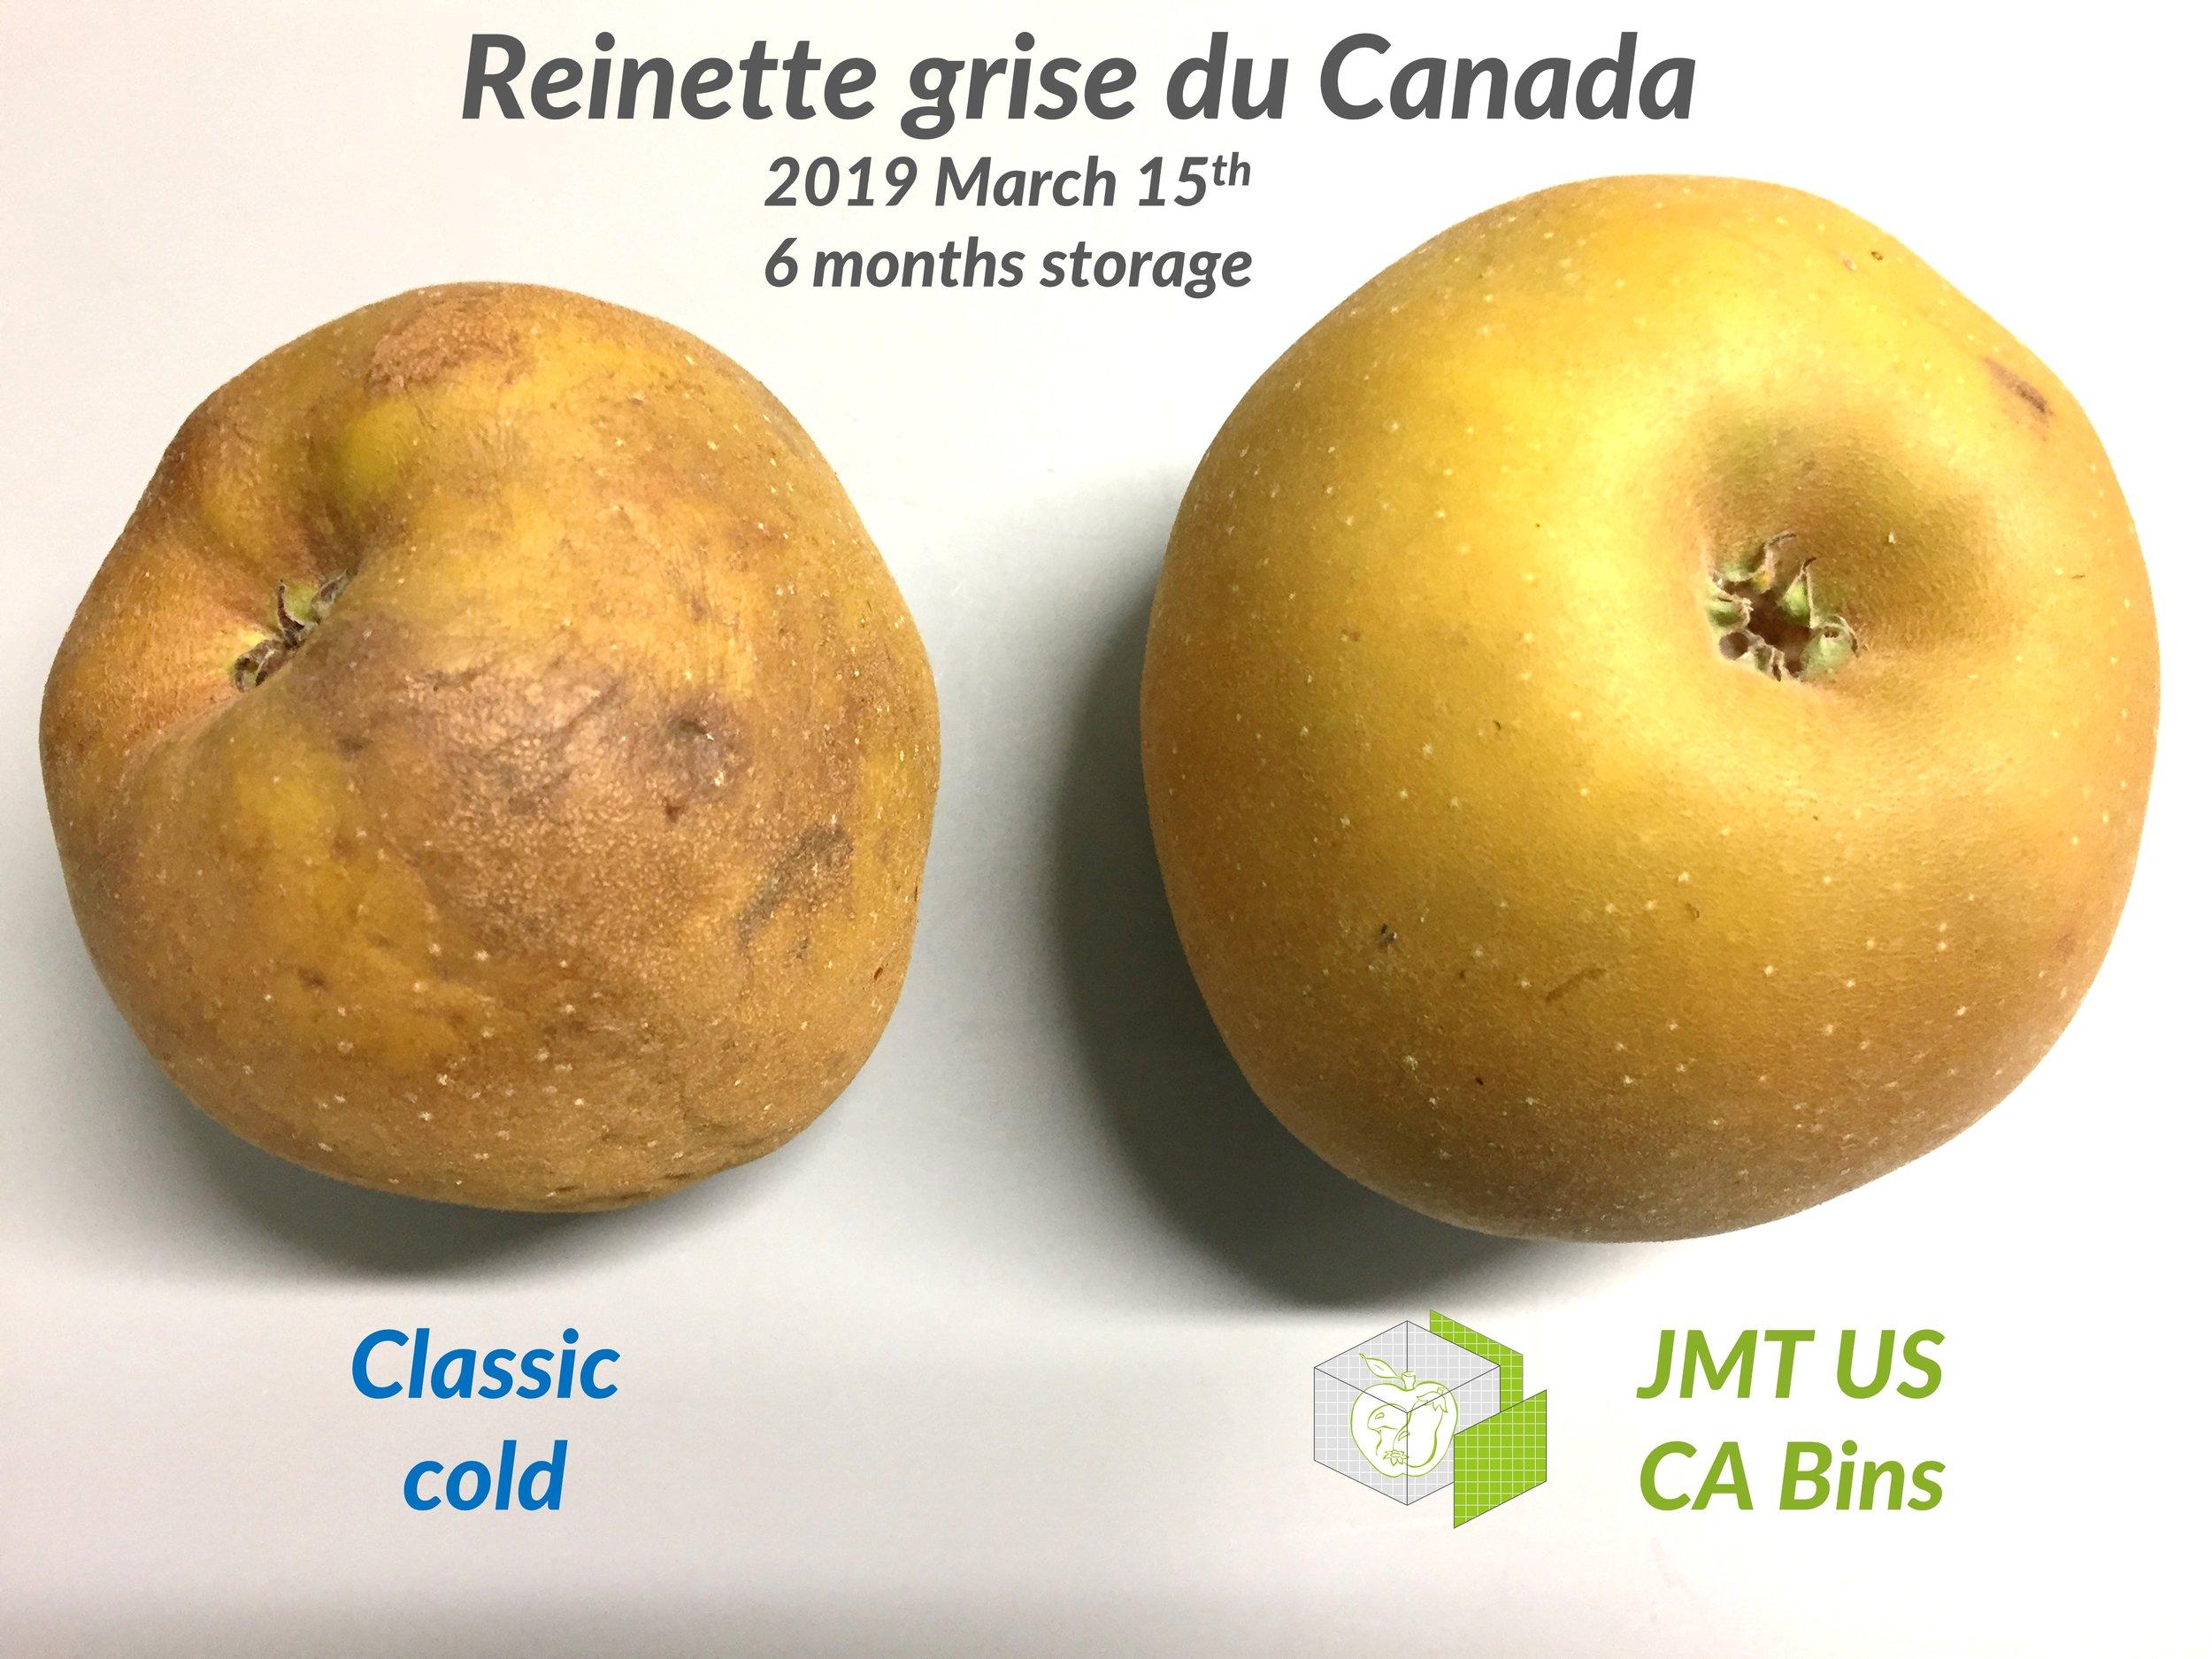 JMT US_Reinette apple_6 months.JPG